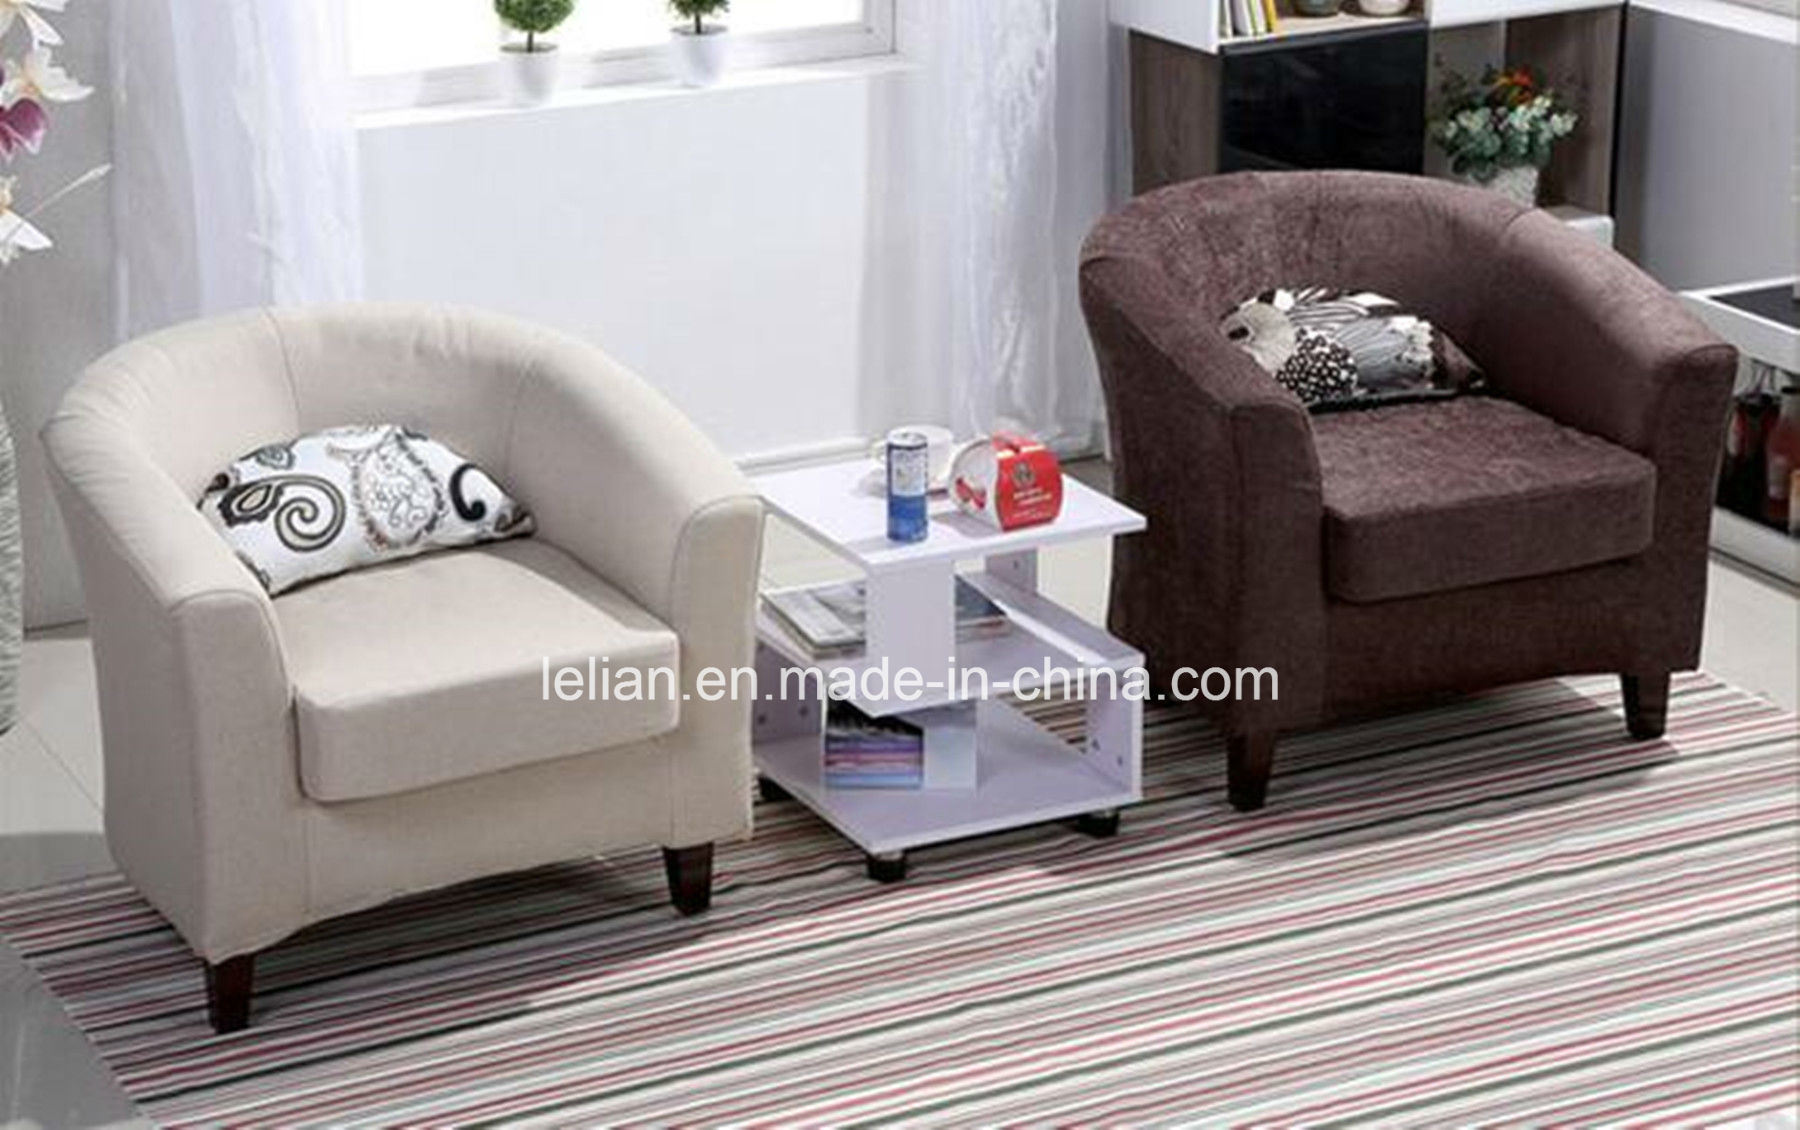 Leisure Bedroom Single Sitting Sofa Chair Comfortable Tub Ll Bc072